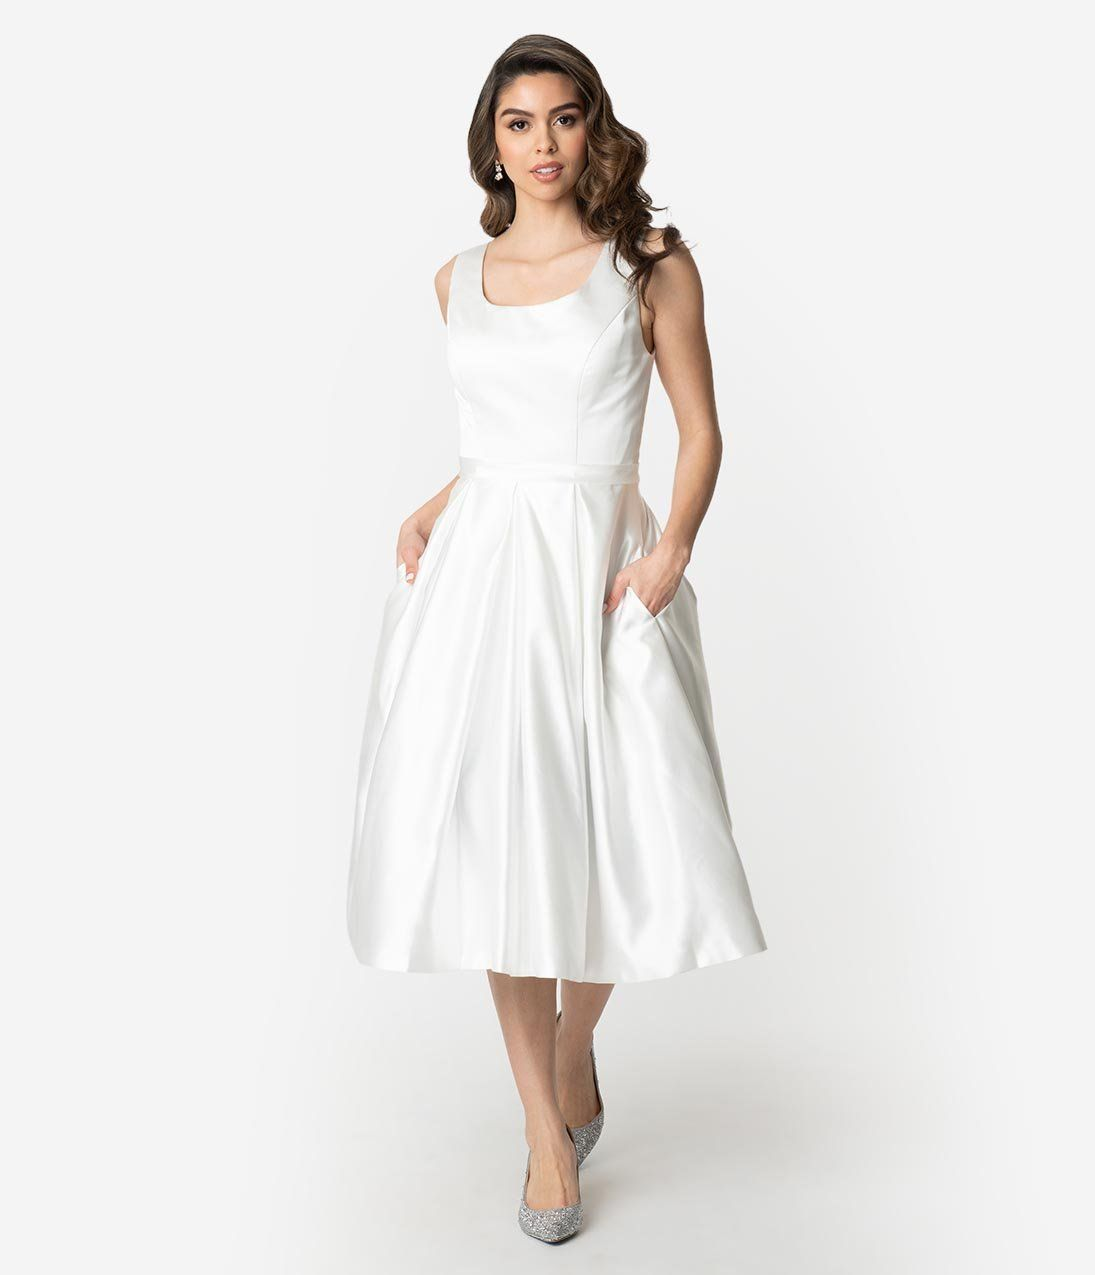 Unique Vintage 1950s Style Ivory Satin Sleeveless Maxime Wedding Dress Dresses White Dresses For Women Unique Dresses [ 1275 x 1095 Pixel ]